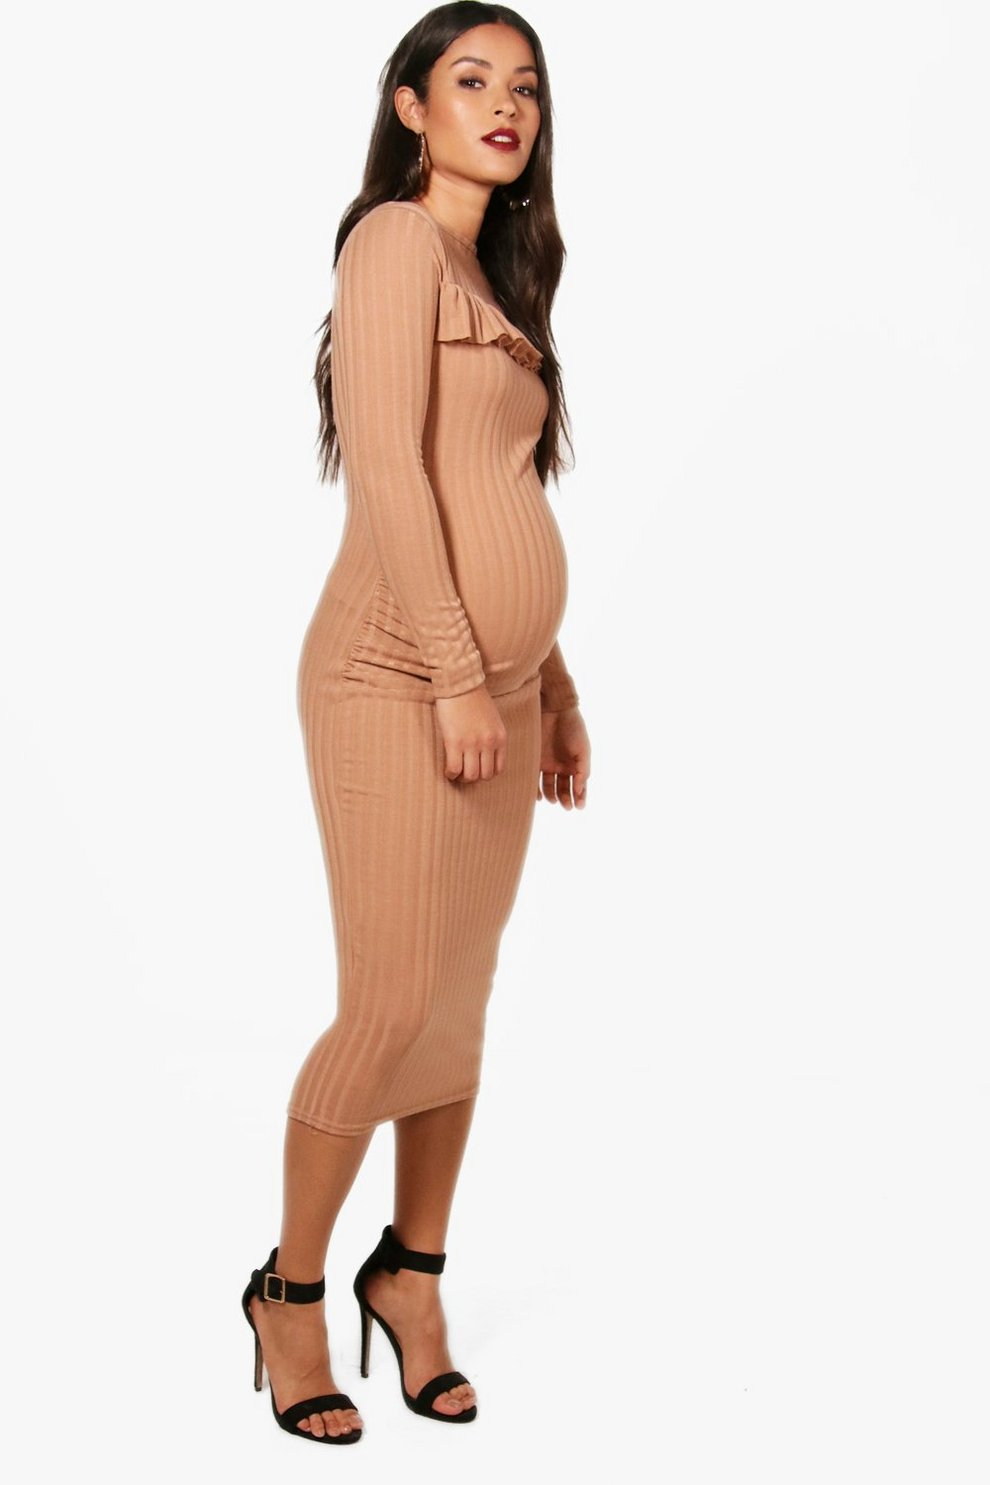 Boohoo Maternity Hayley Ruffle Detail Ribbed Long Sleeve Midi Dress Clearance Comfortable 2xE1Lv